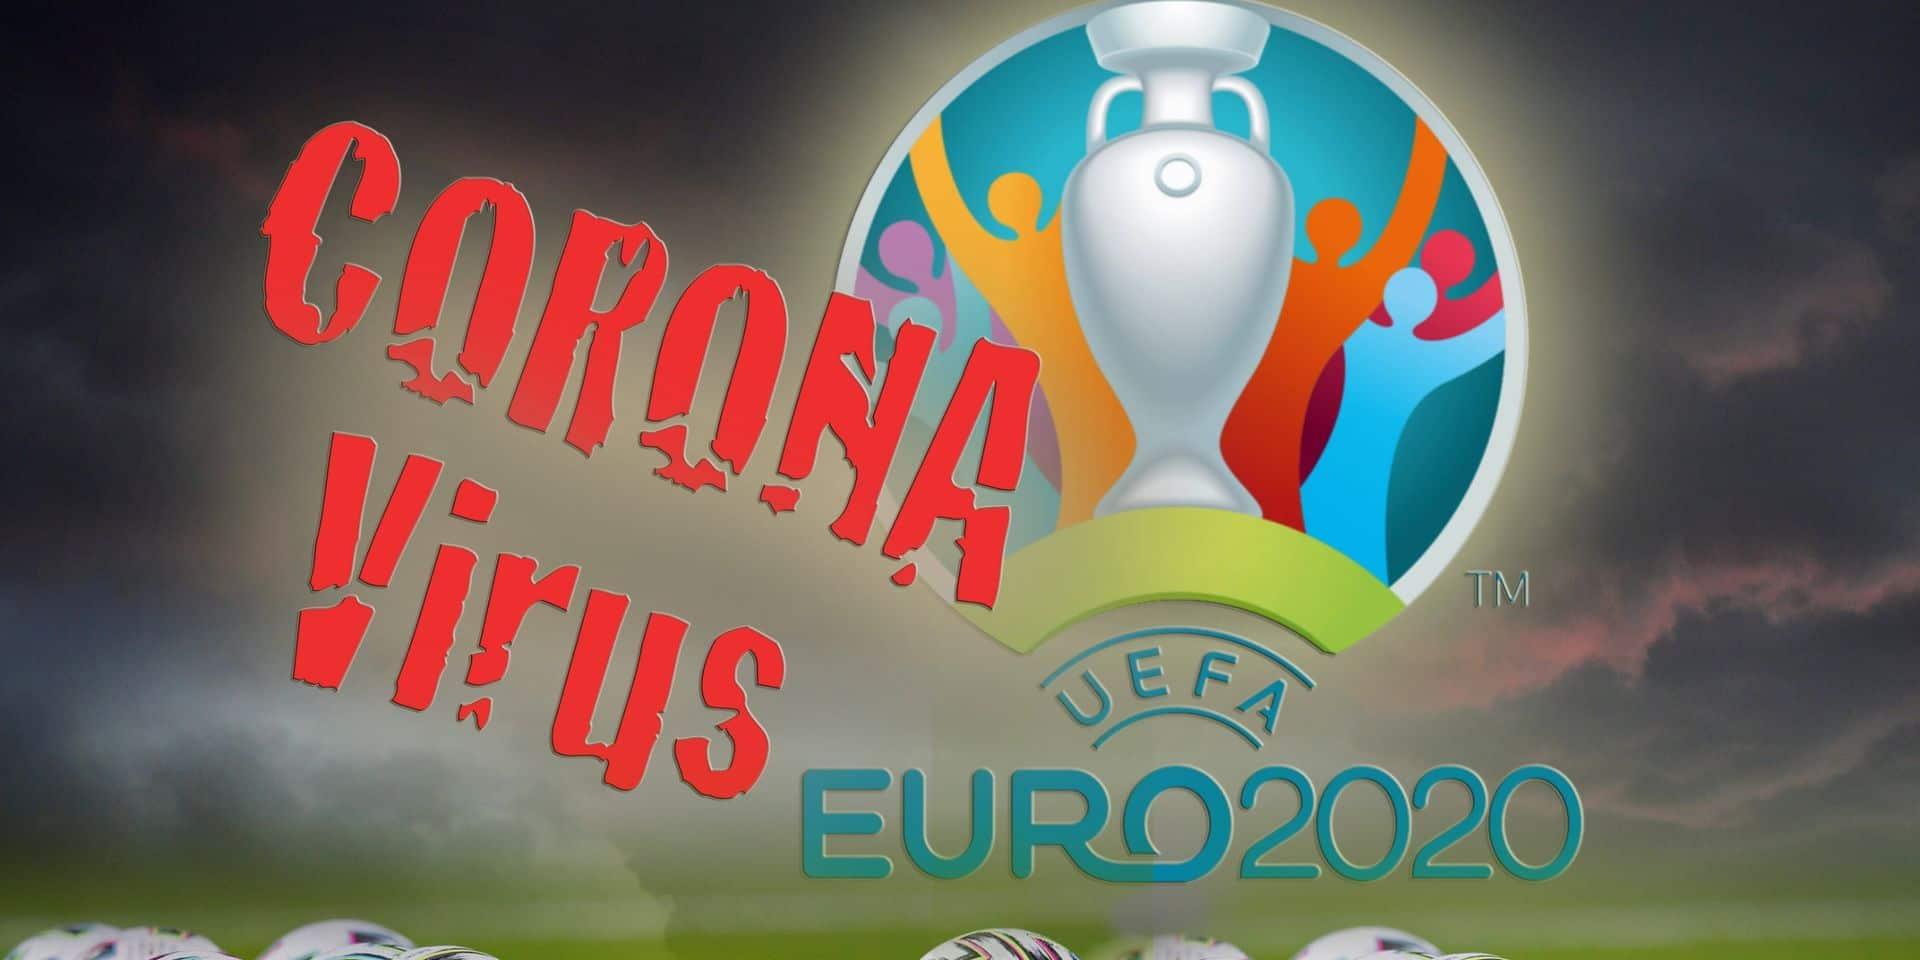 L'Euro 2020 gardera son nom, même s'il se dispute en 2021 !